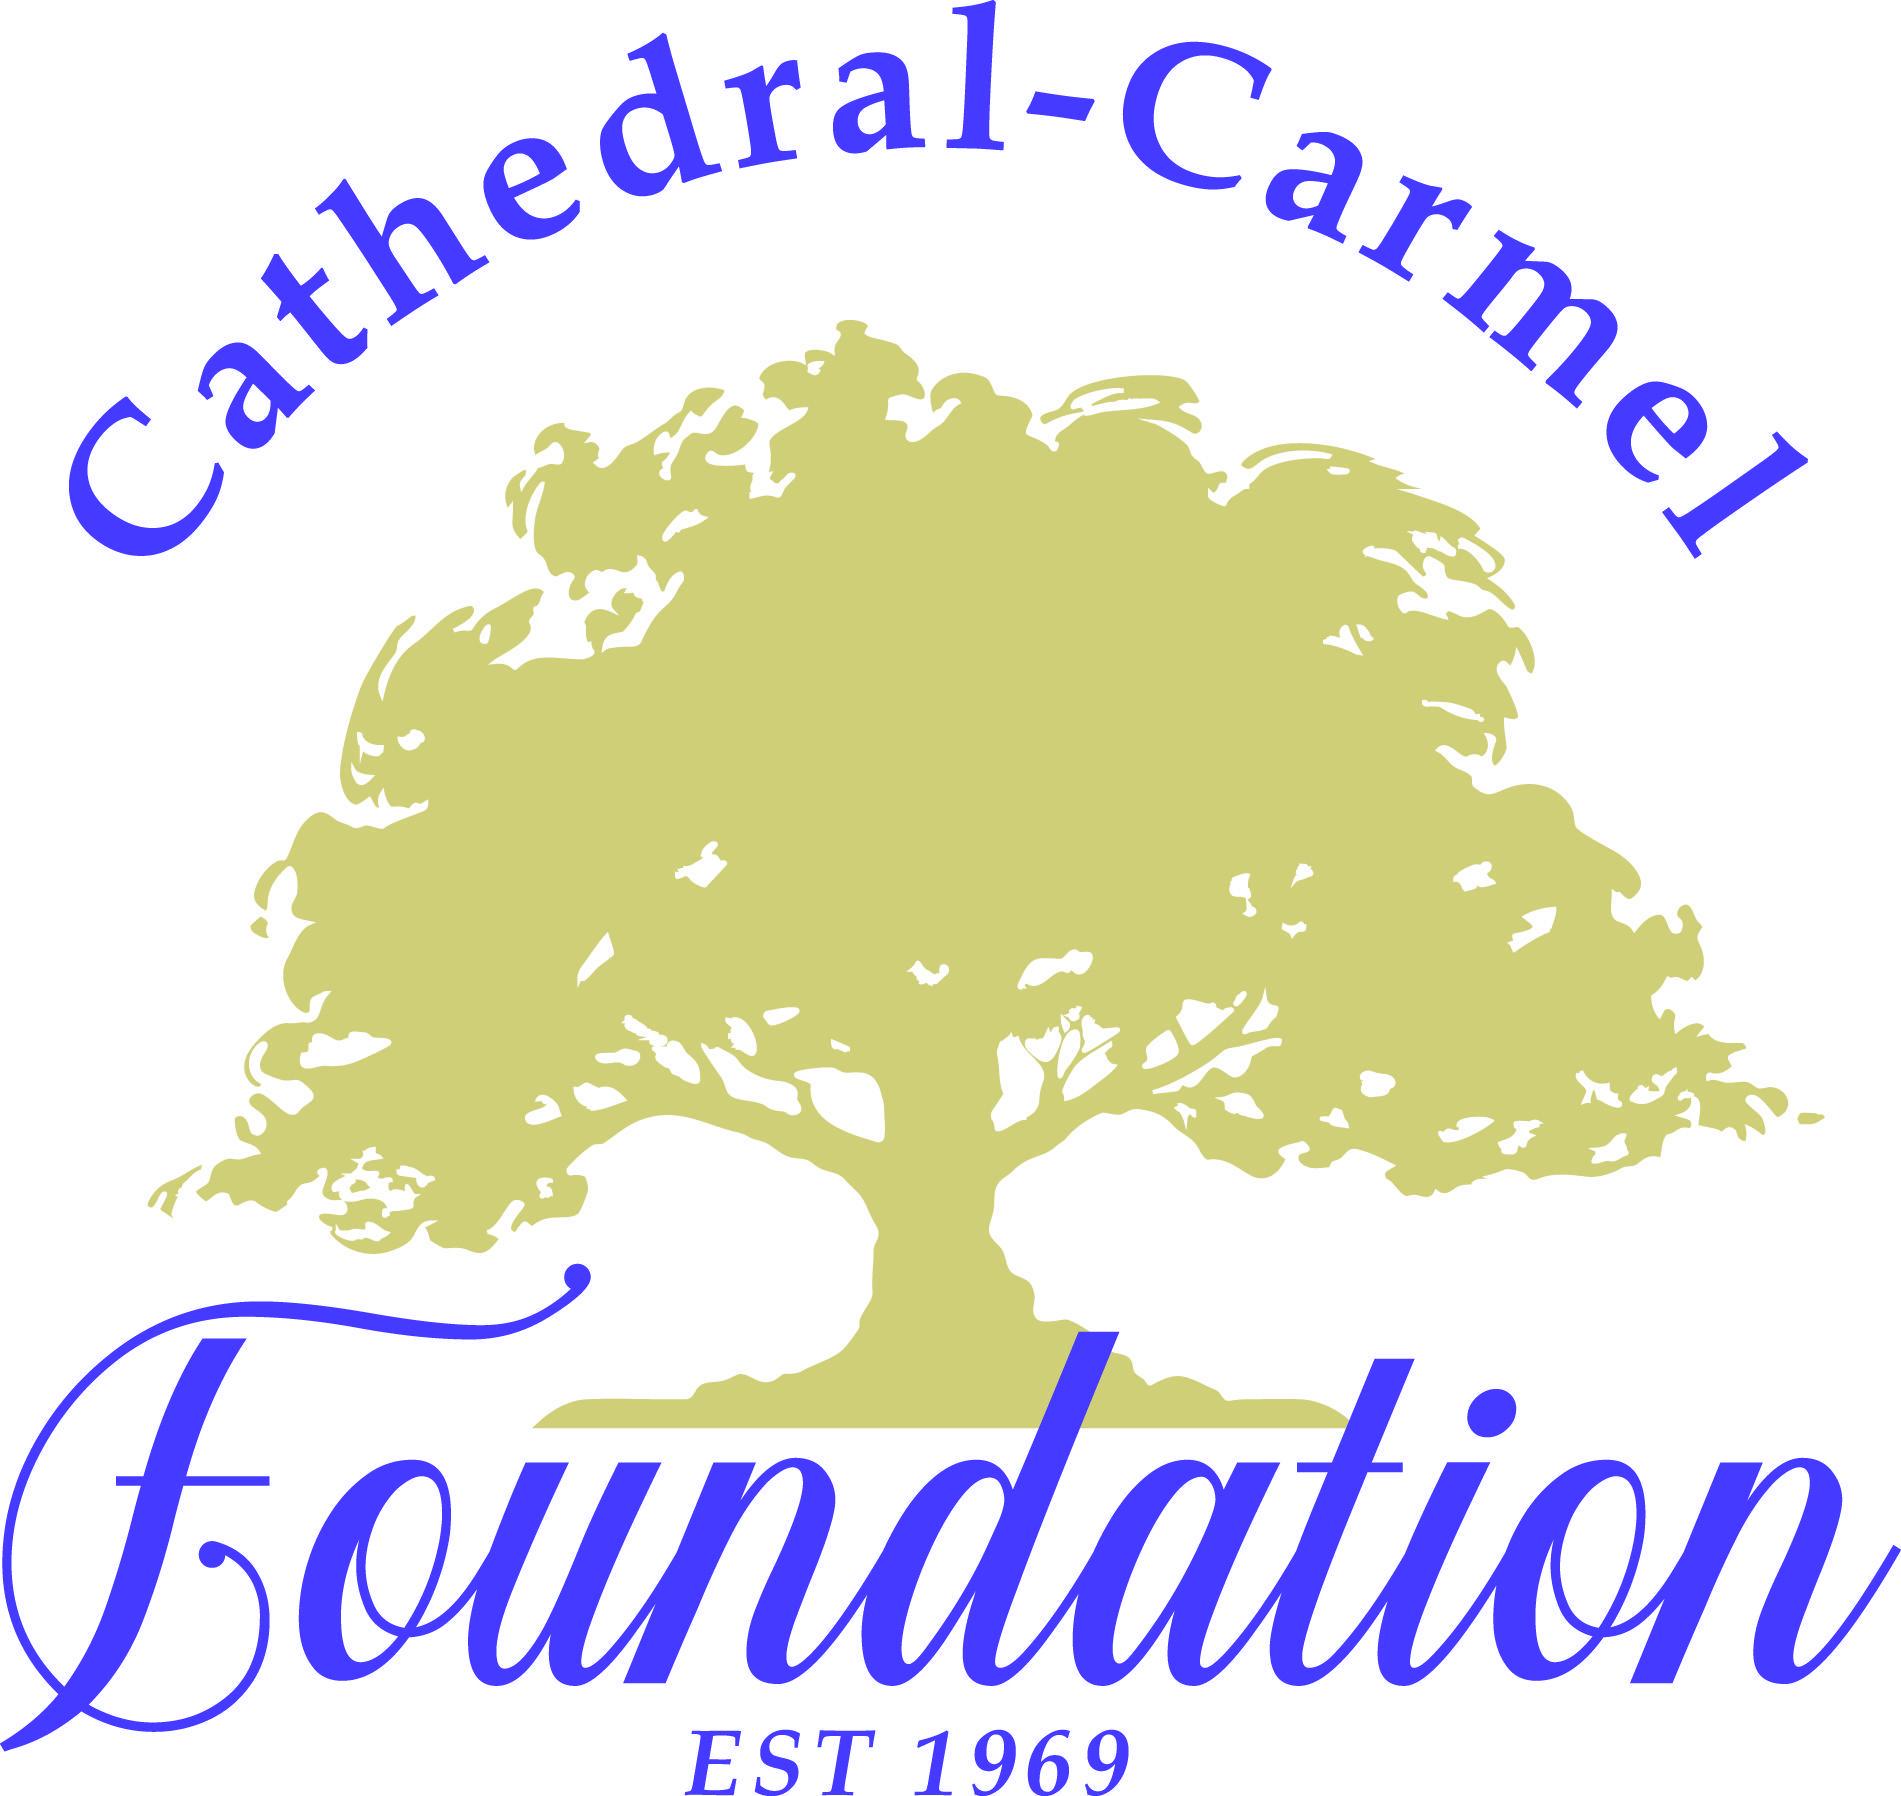 Cathedral-Carmel Foundation